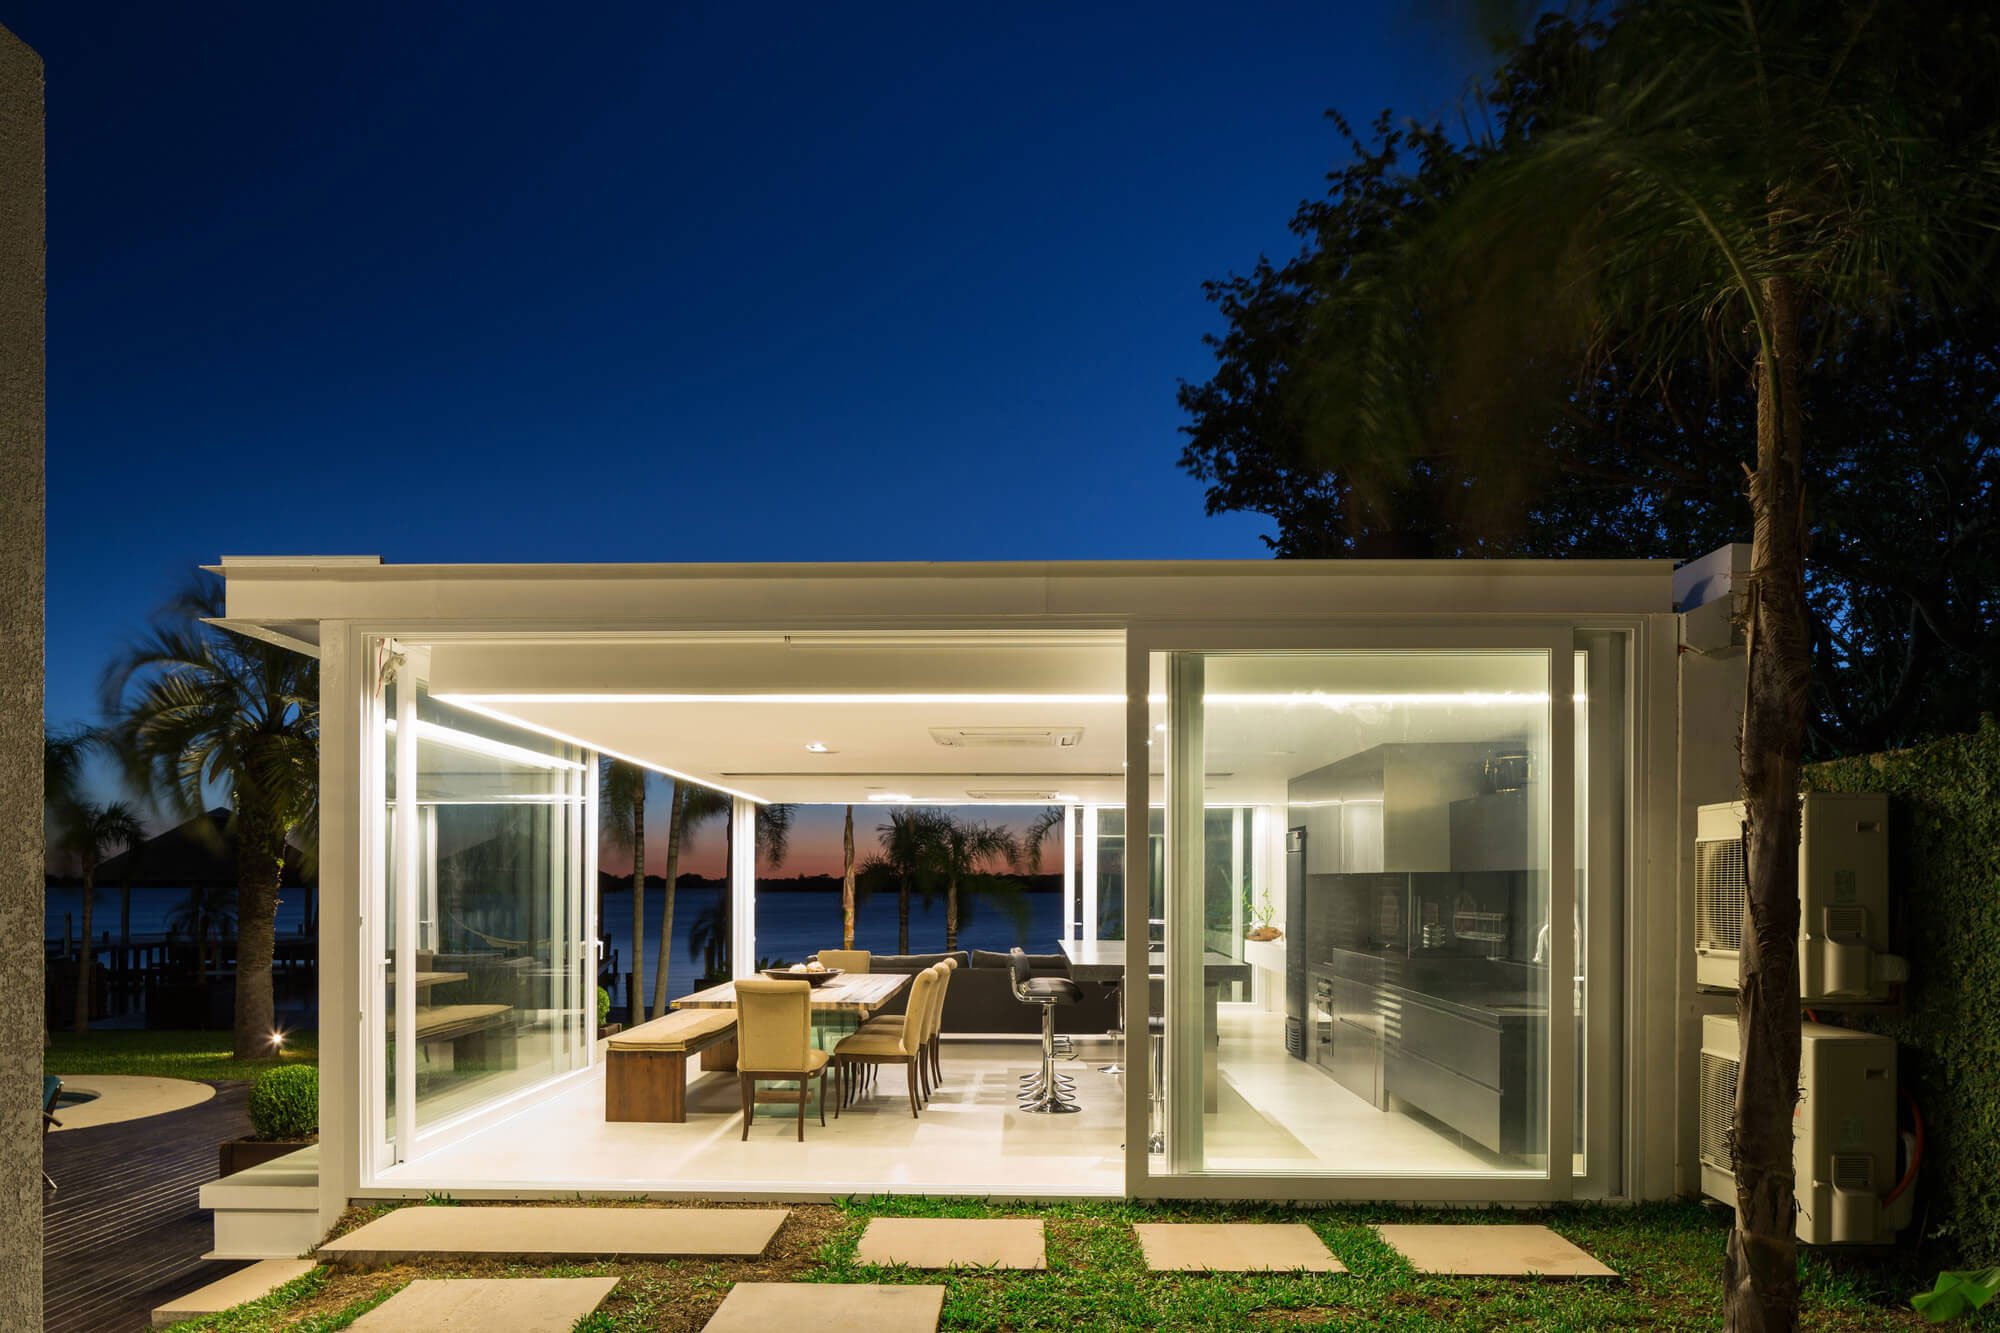 Pool-House-in-Porto-Alegre-21